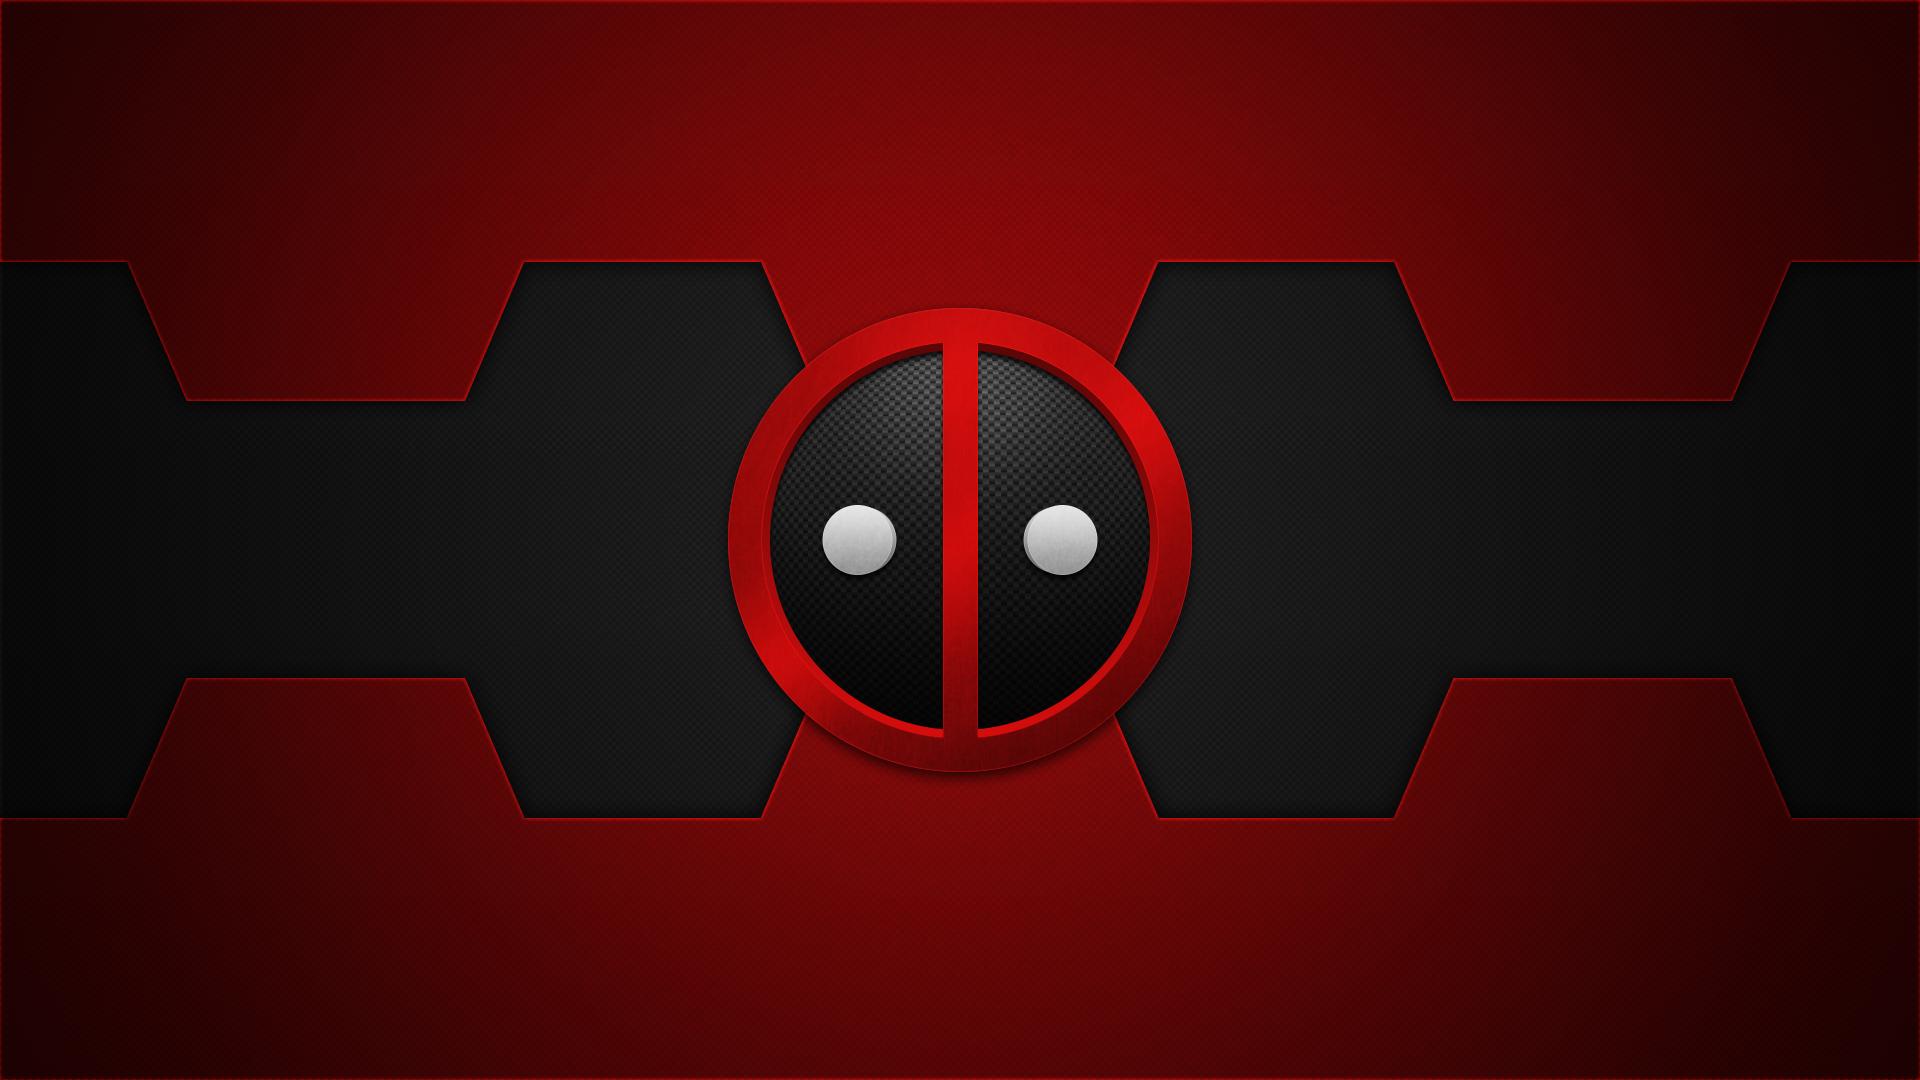 Deadpool Logo Wallpaper - WallpaperSafari